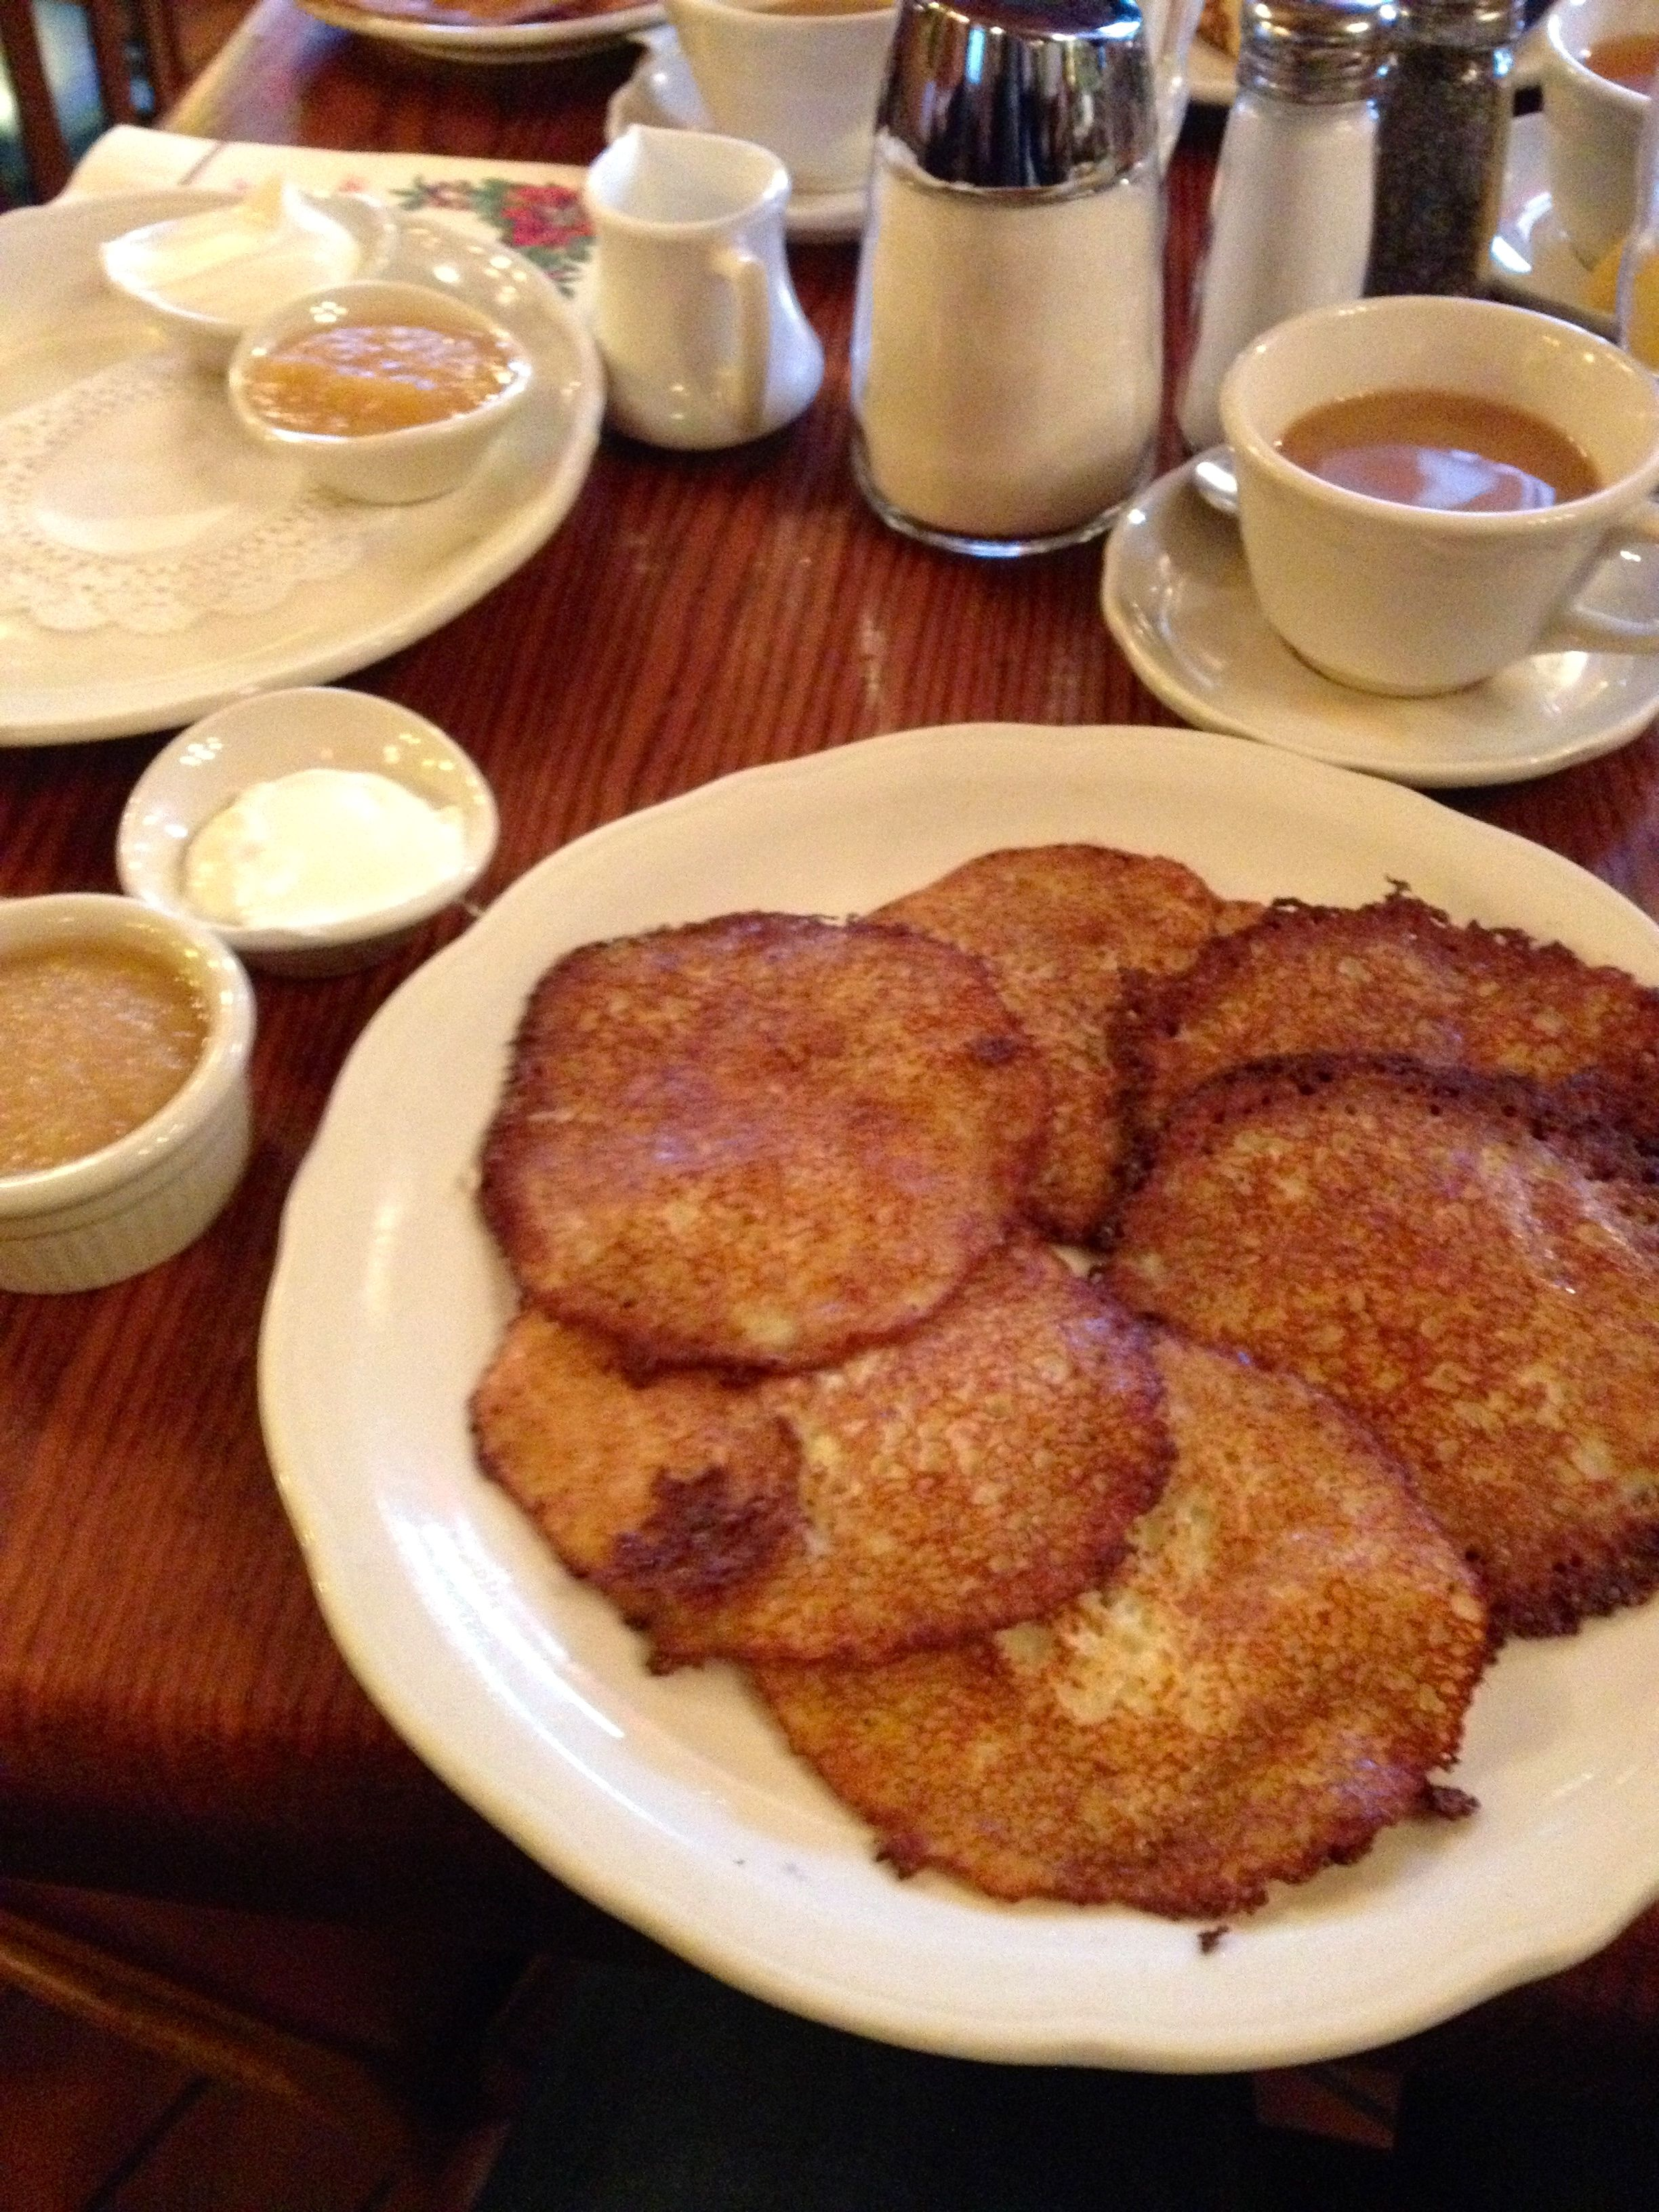 Potato Pancakes at The Original Pancake House A Month of Dining